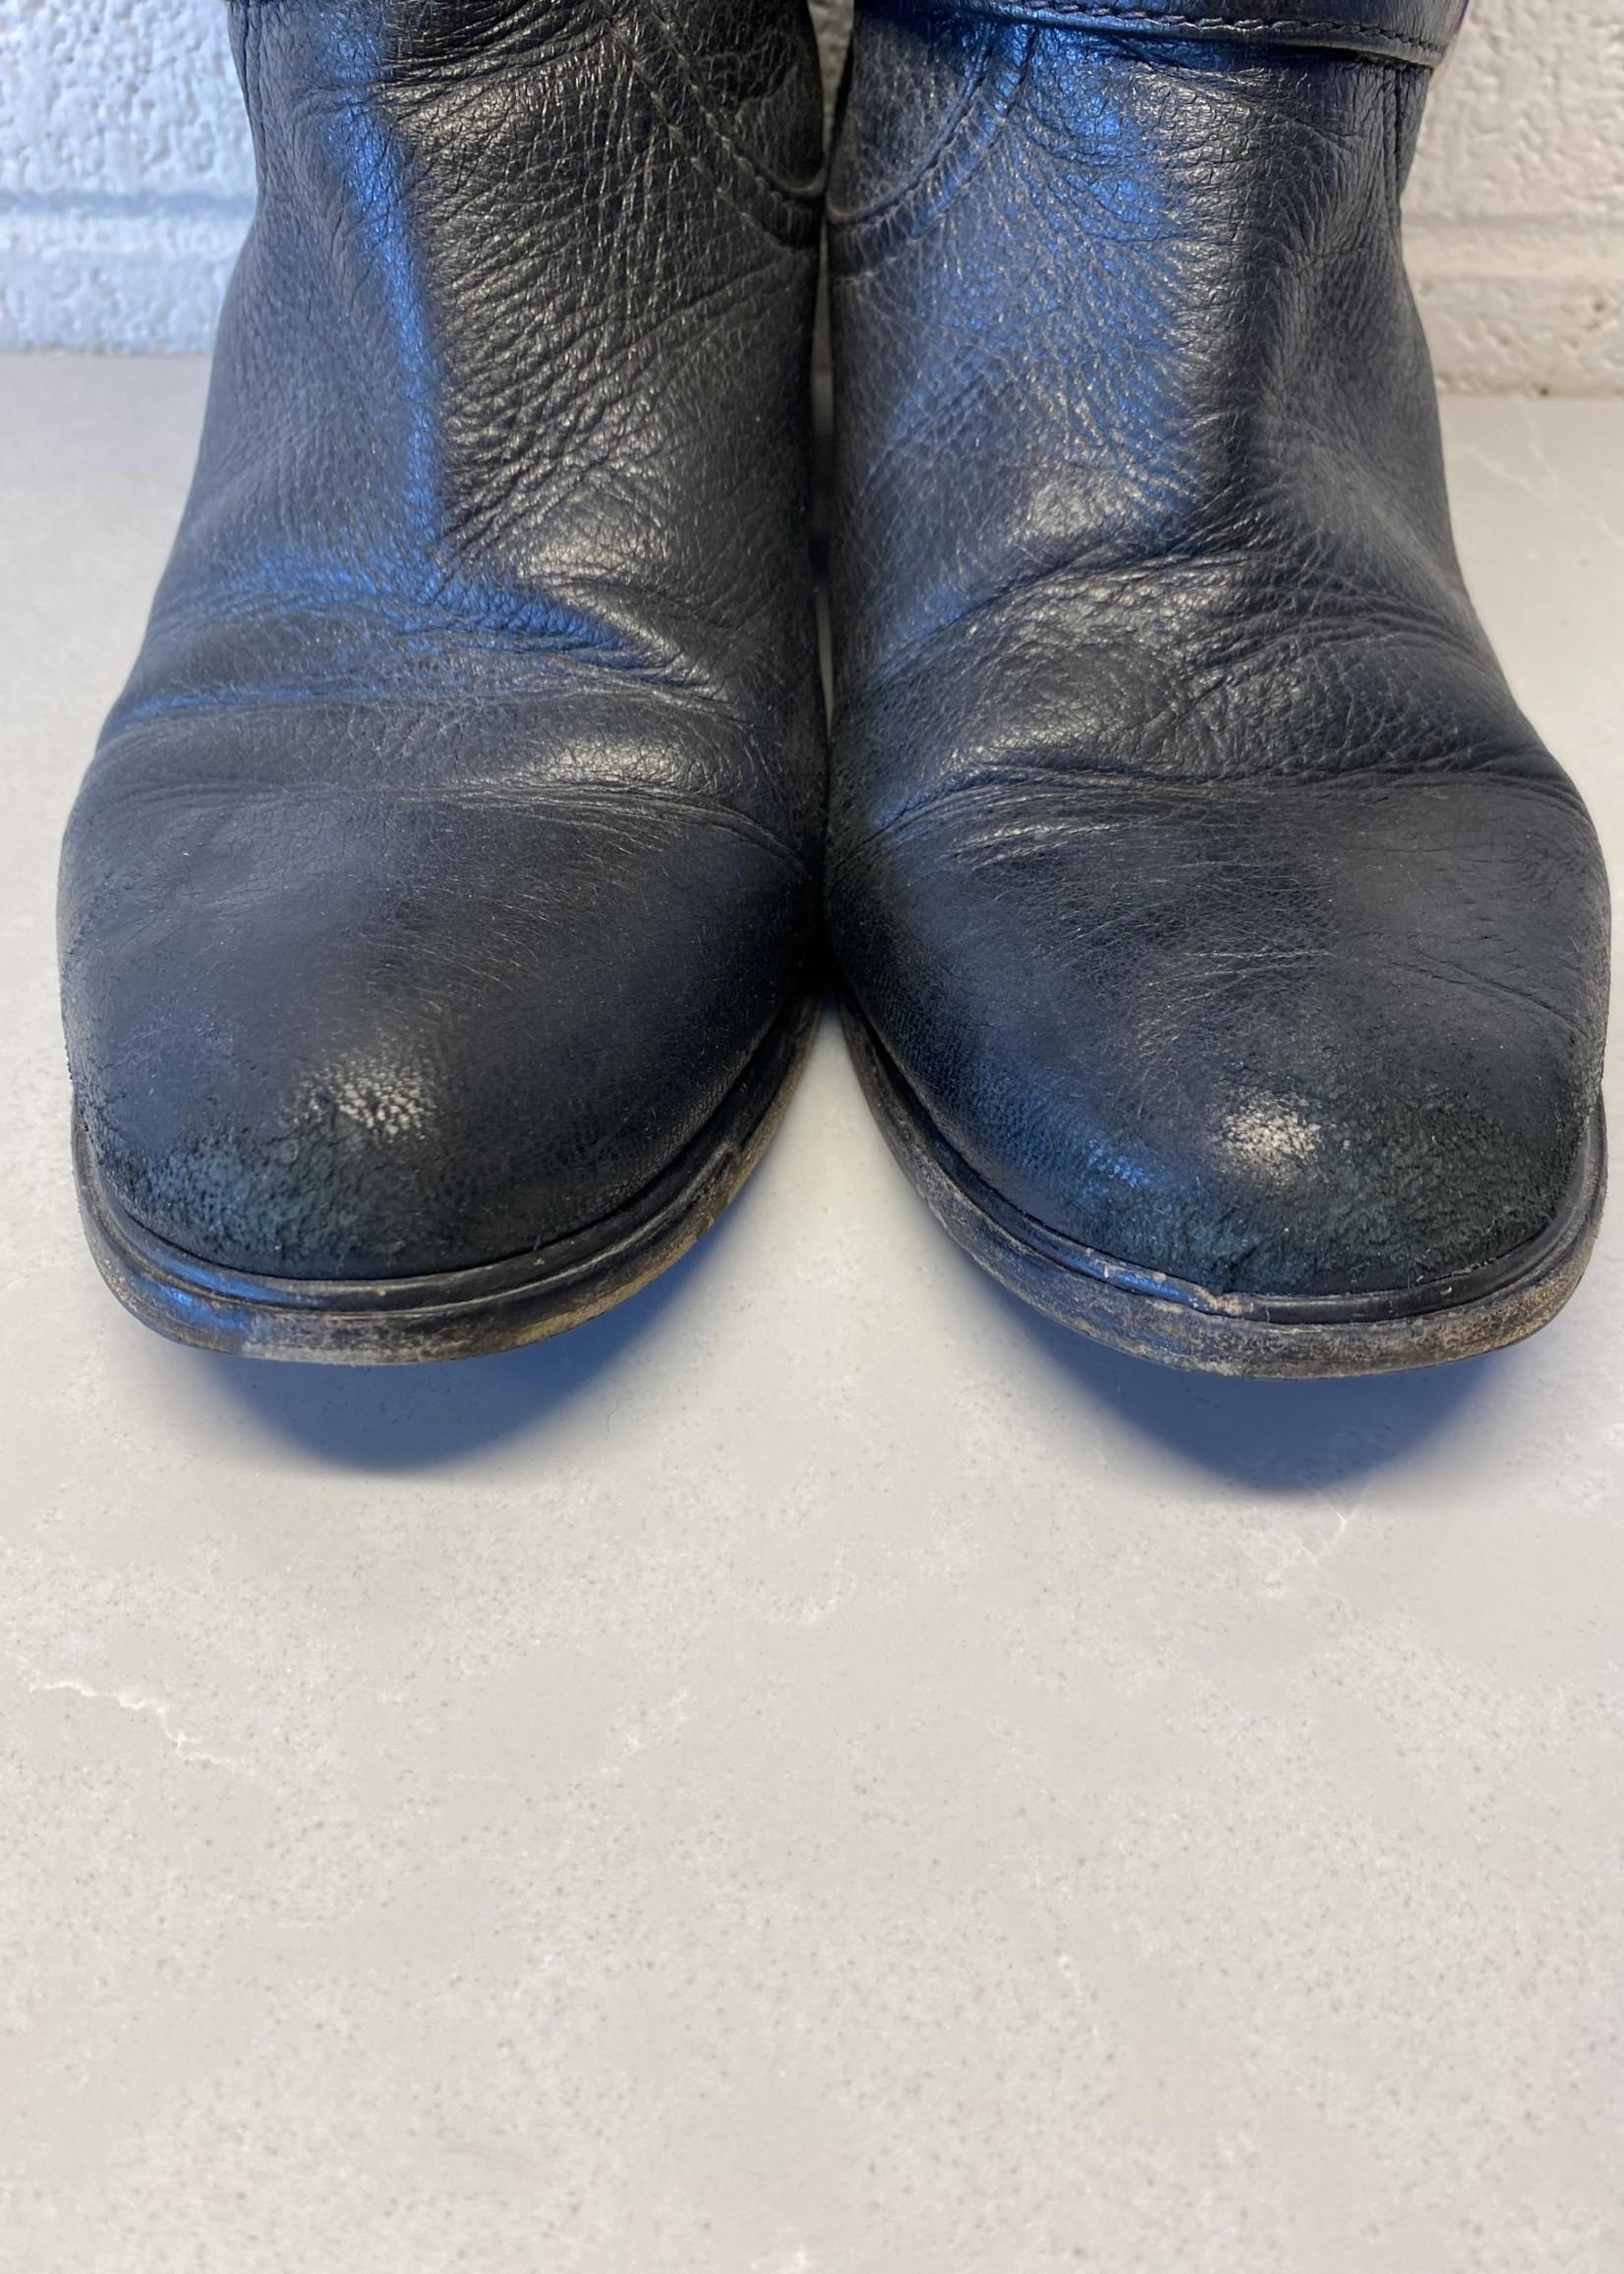 Prada Cervo Leather Buckle Boots 38